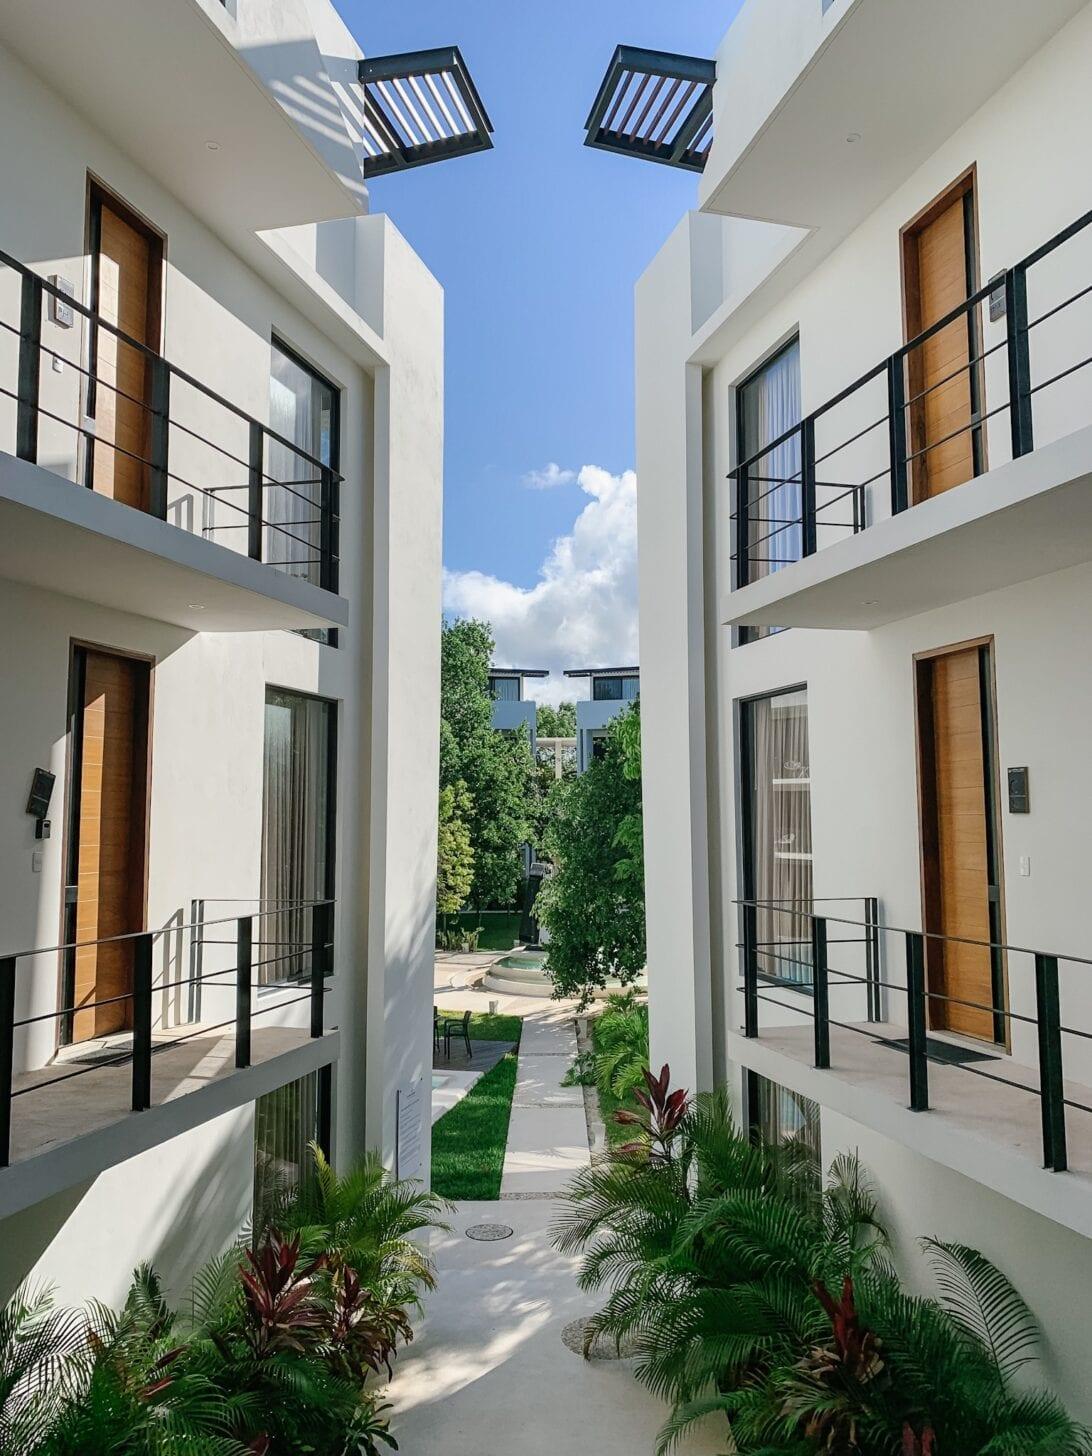 Tulum hotels, Airbnb, Tulum accommodation